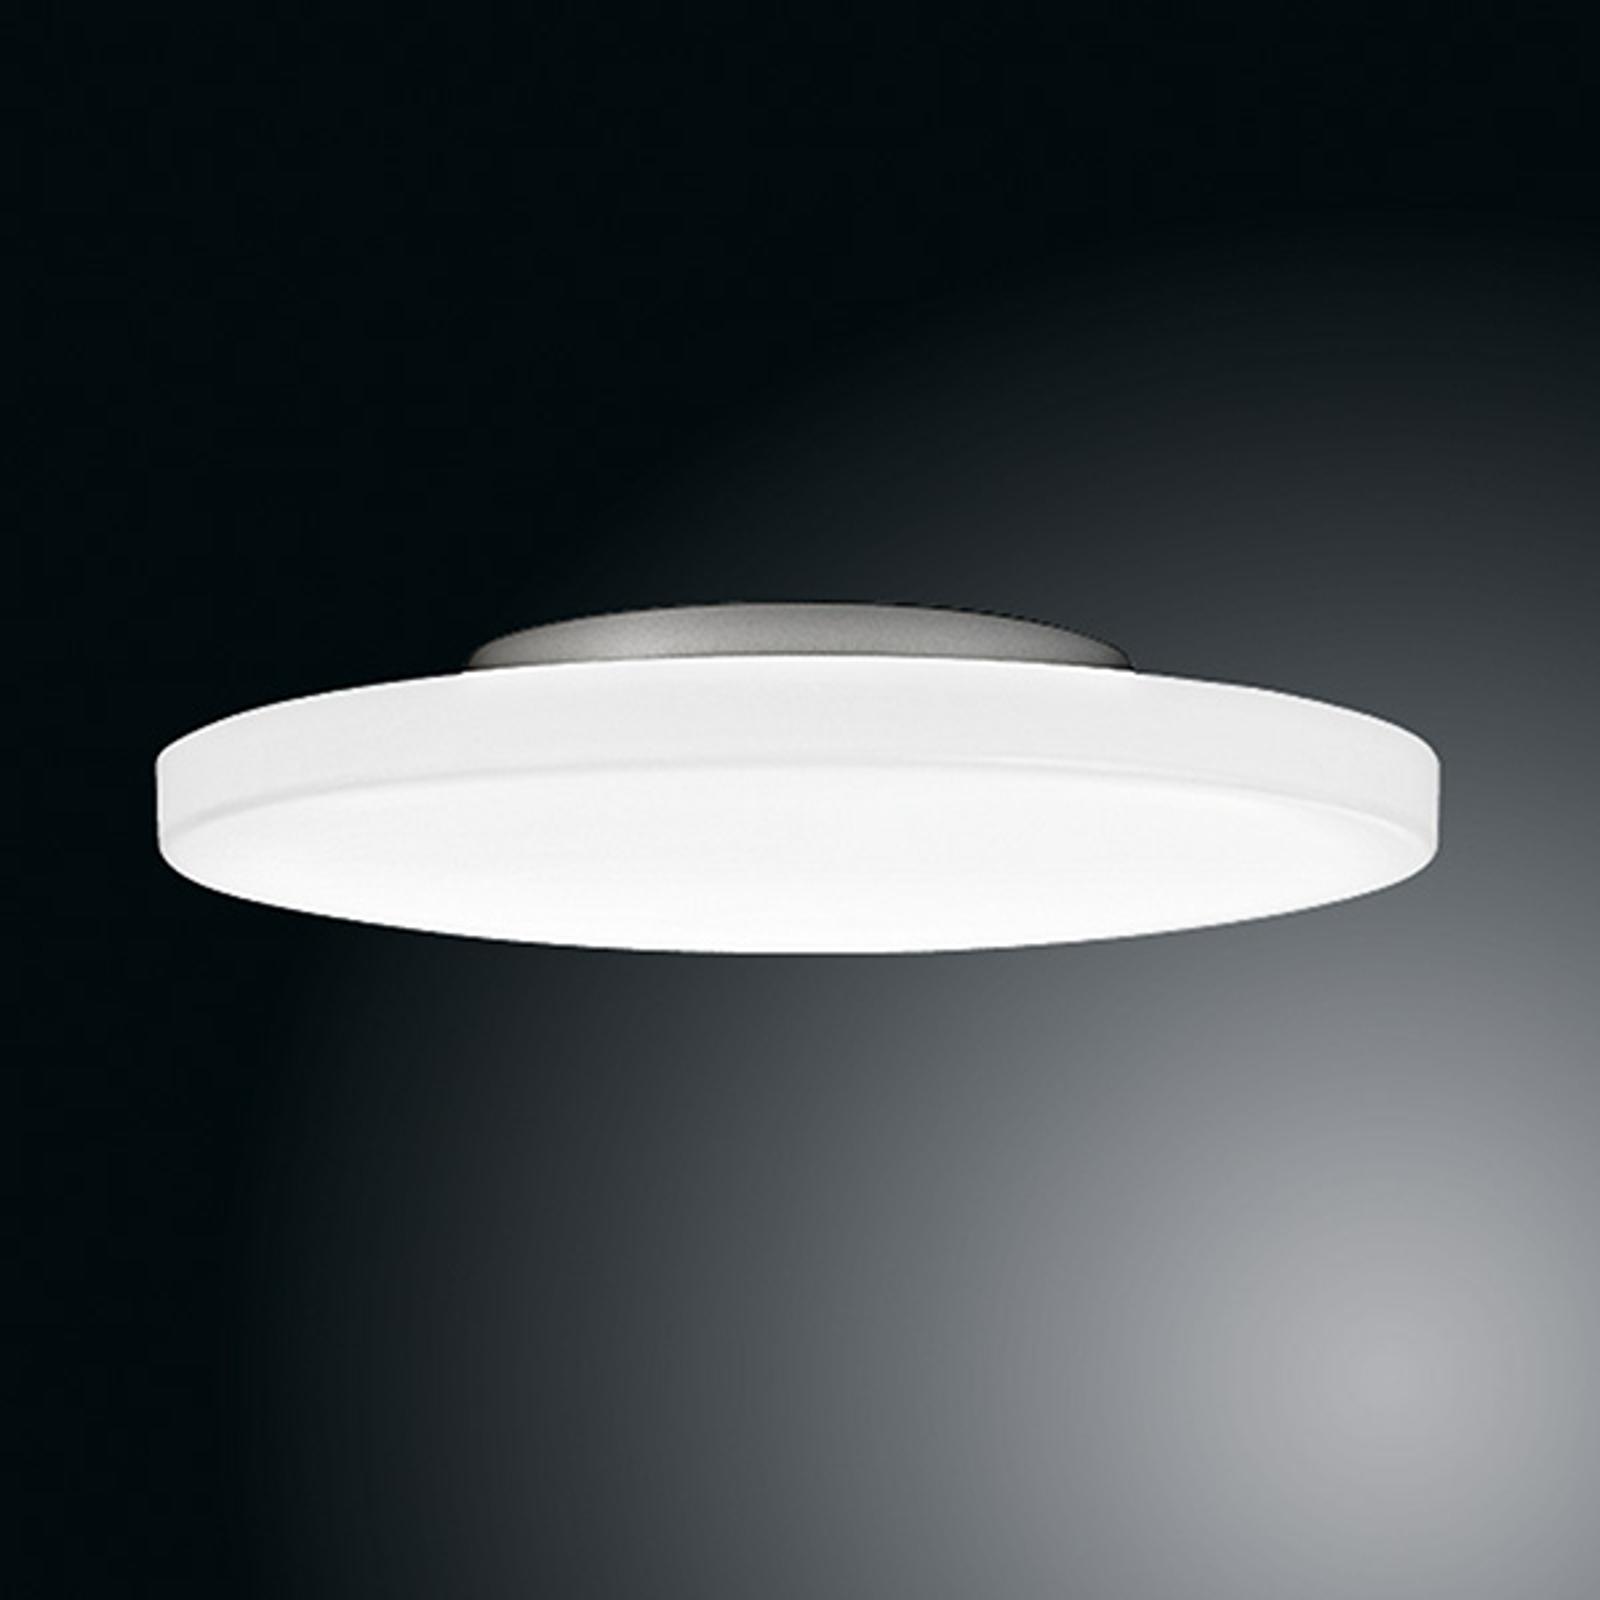 Ribag Punto LED-Anbauleuchte 32 cm, universalweiß